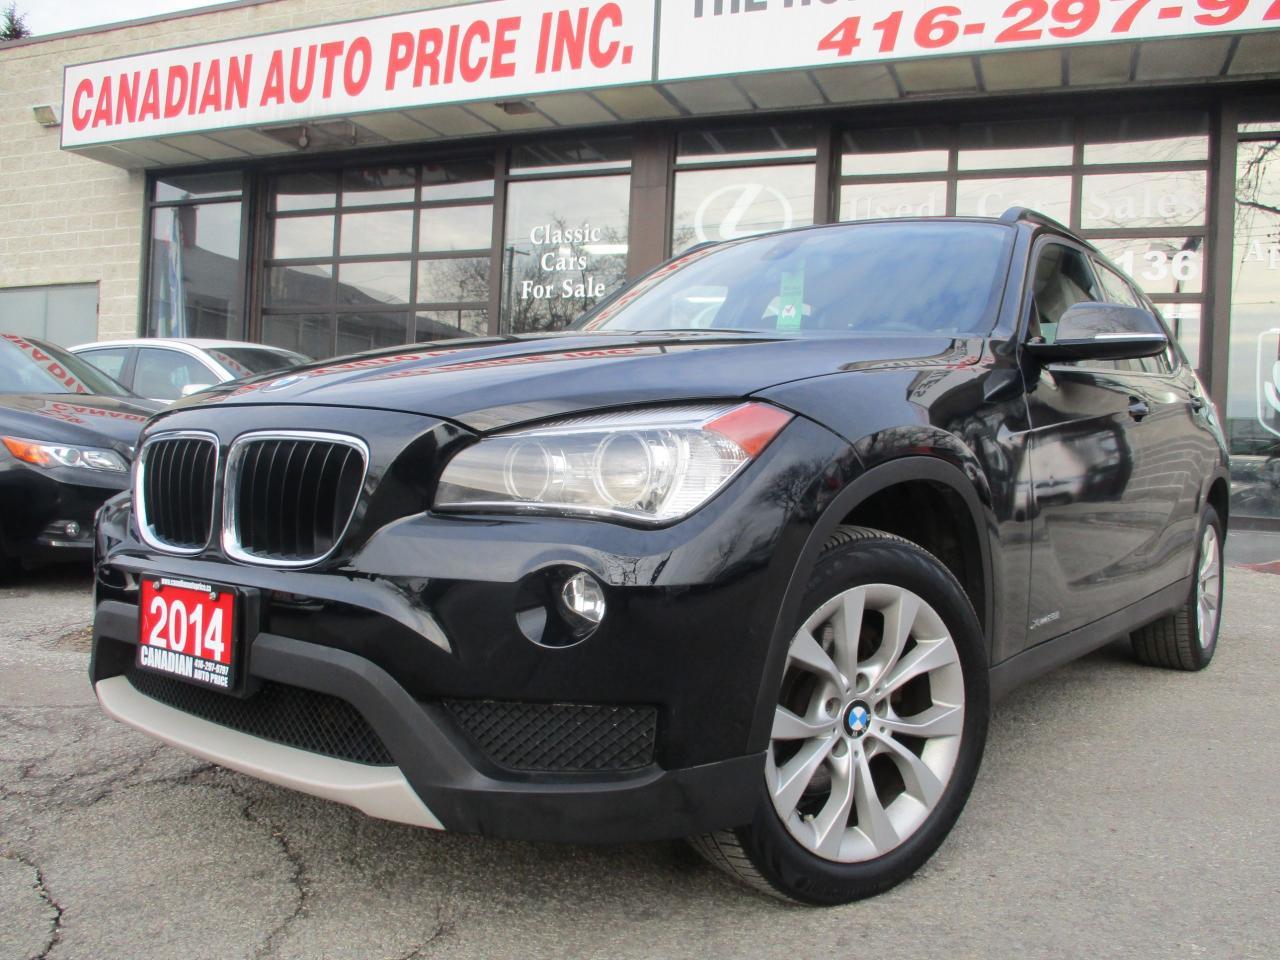 2014 BMW X1 xDrive28i-PRM-PKG-PANORAMIC-ROOF-LOADED